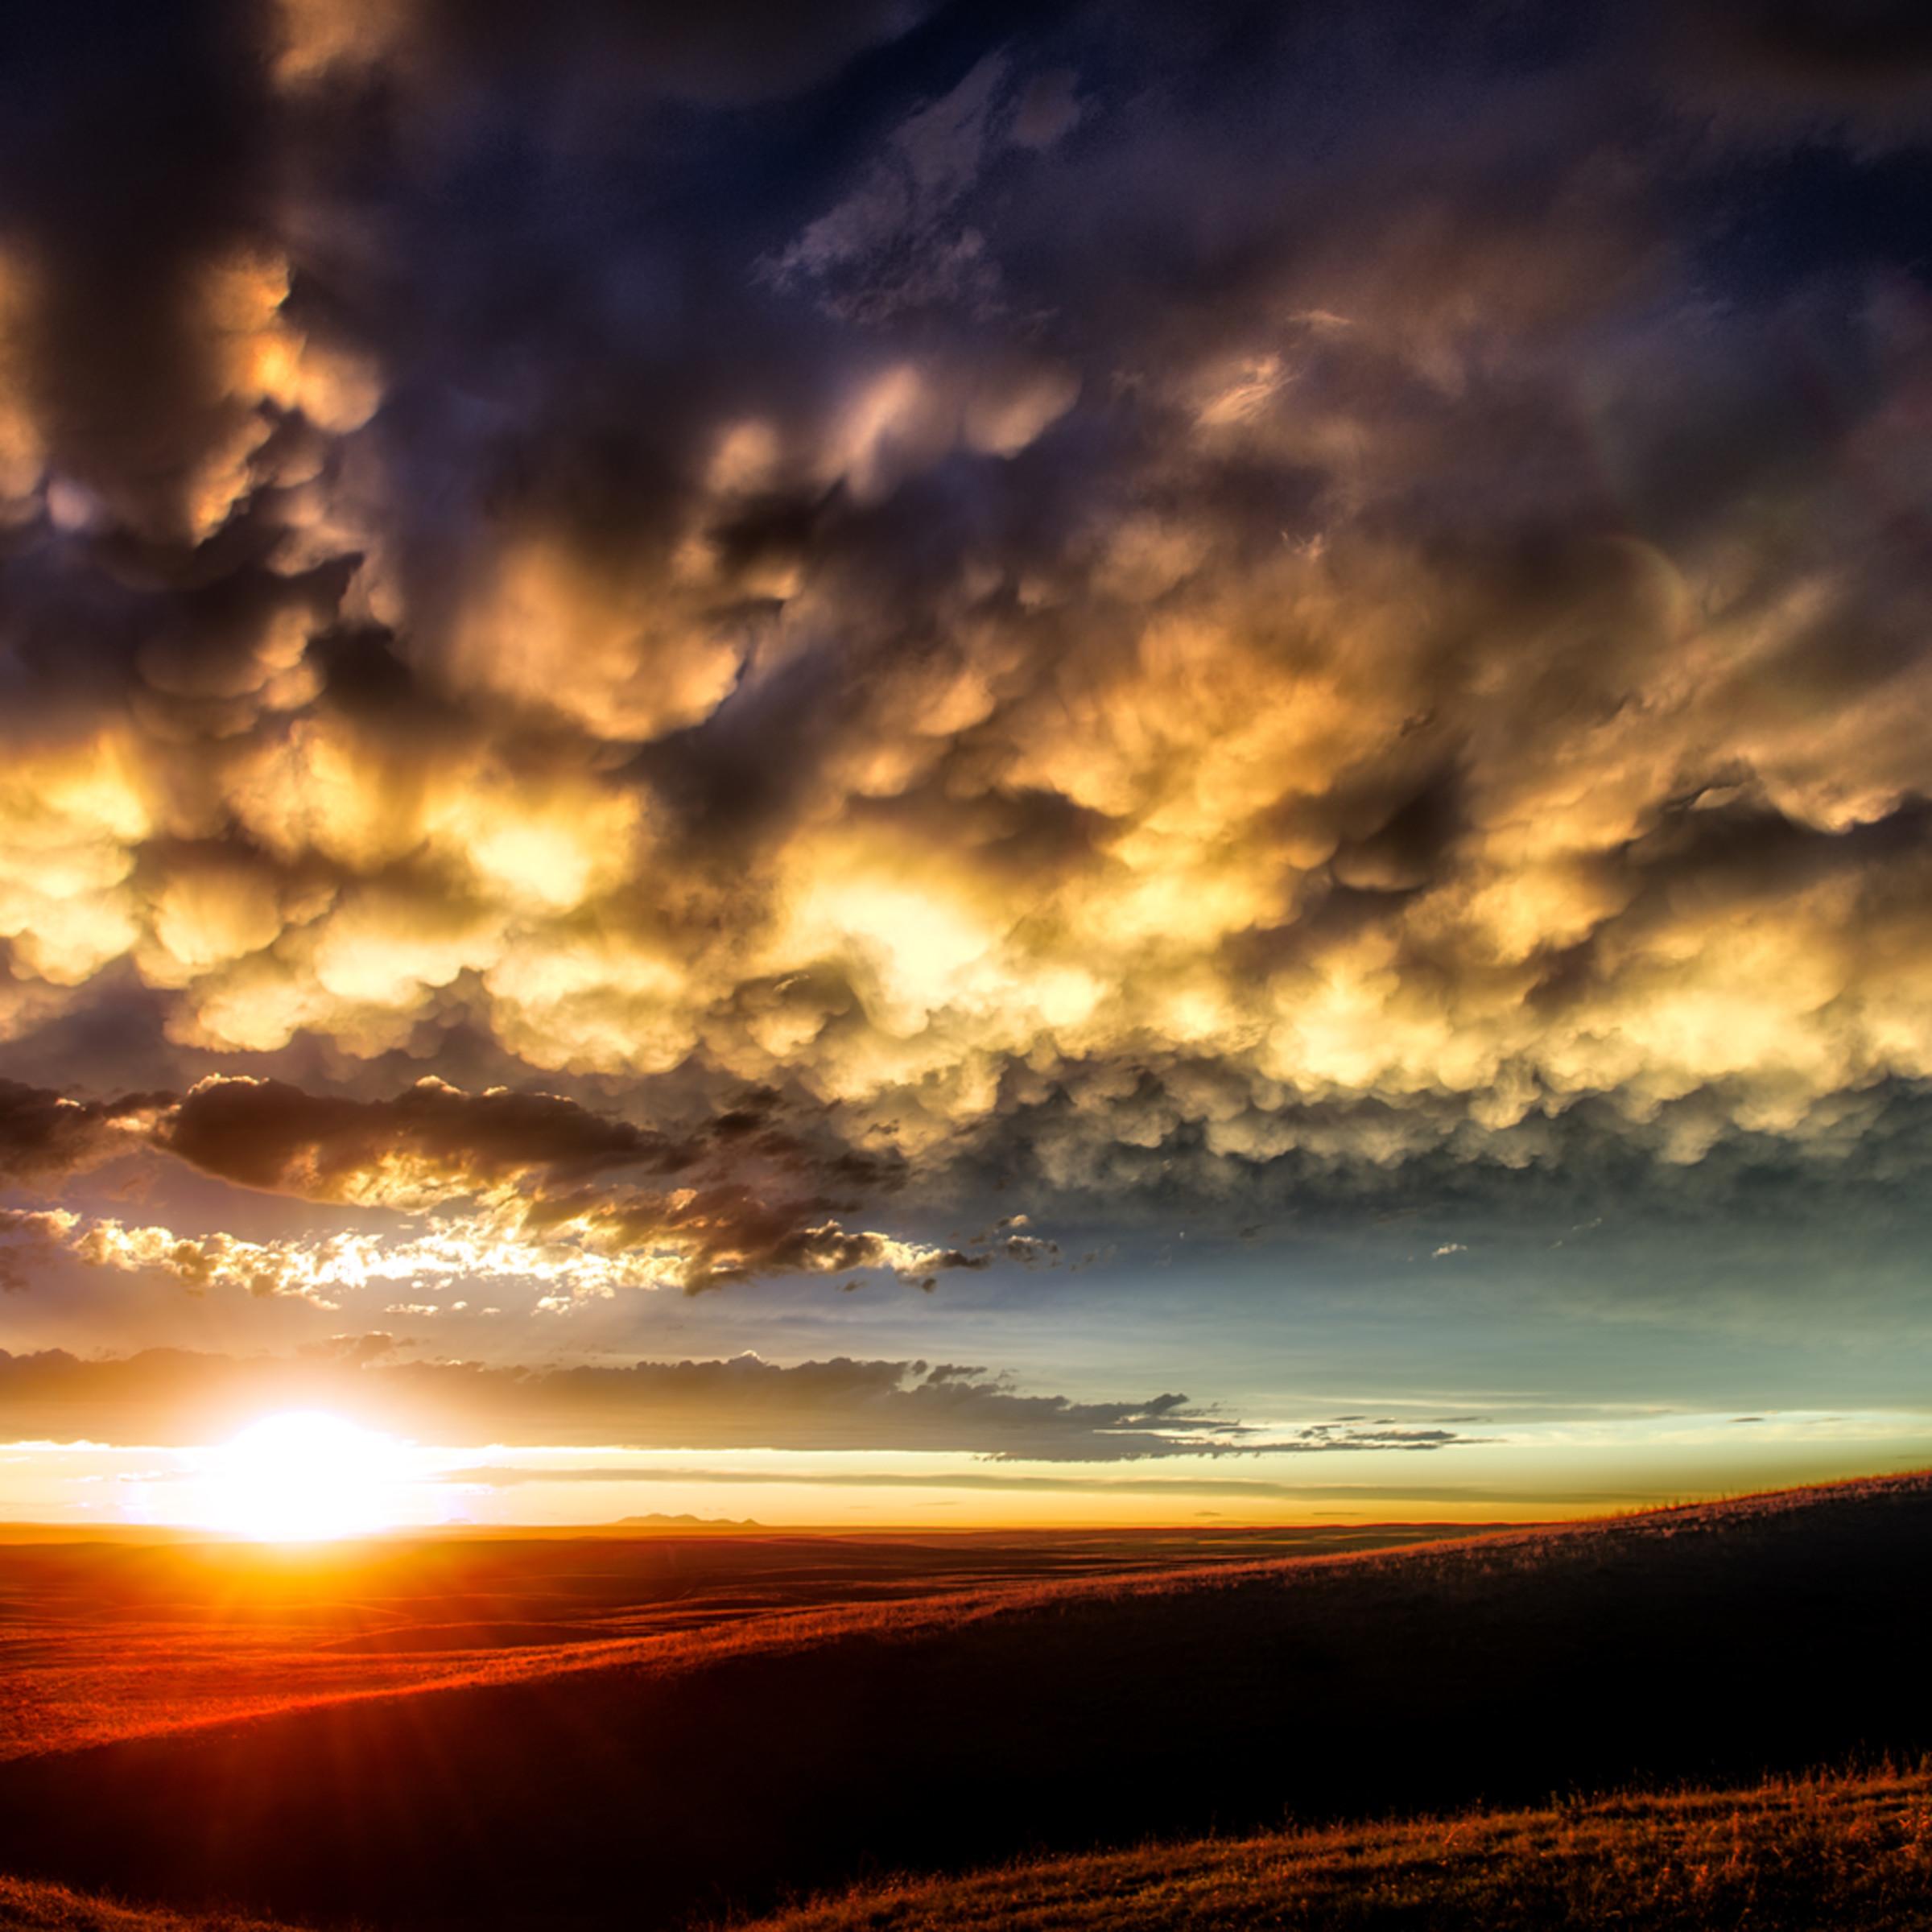 Sweetgrass sunset sh7n4o